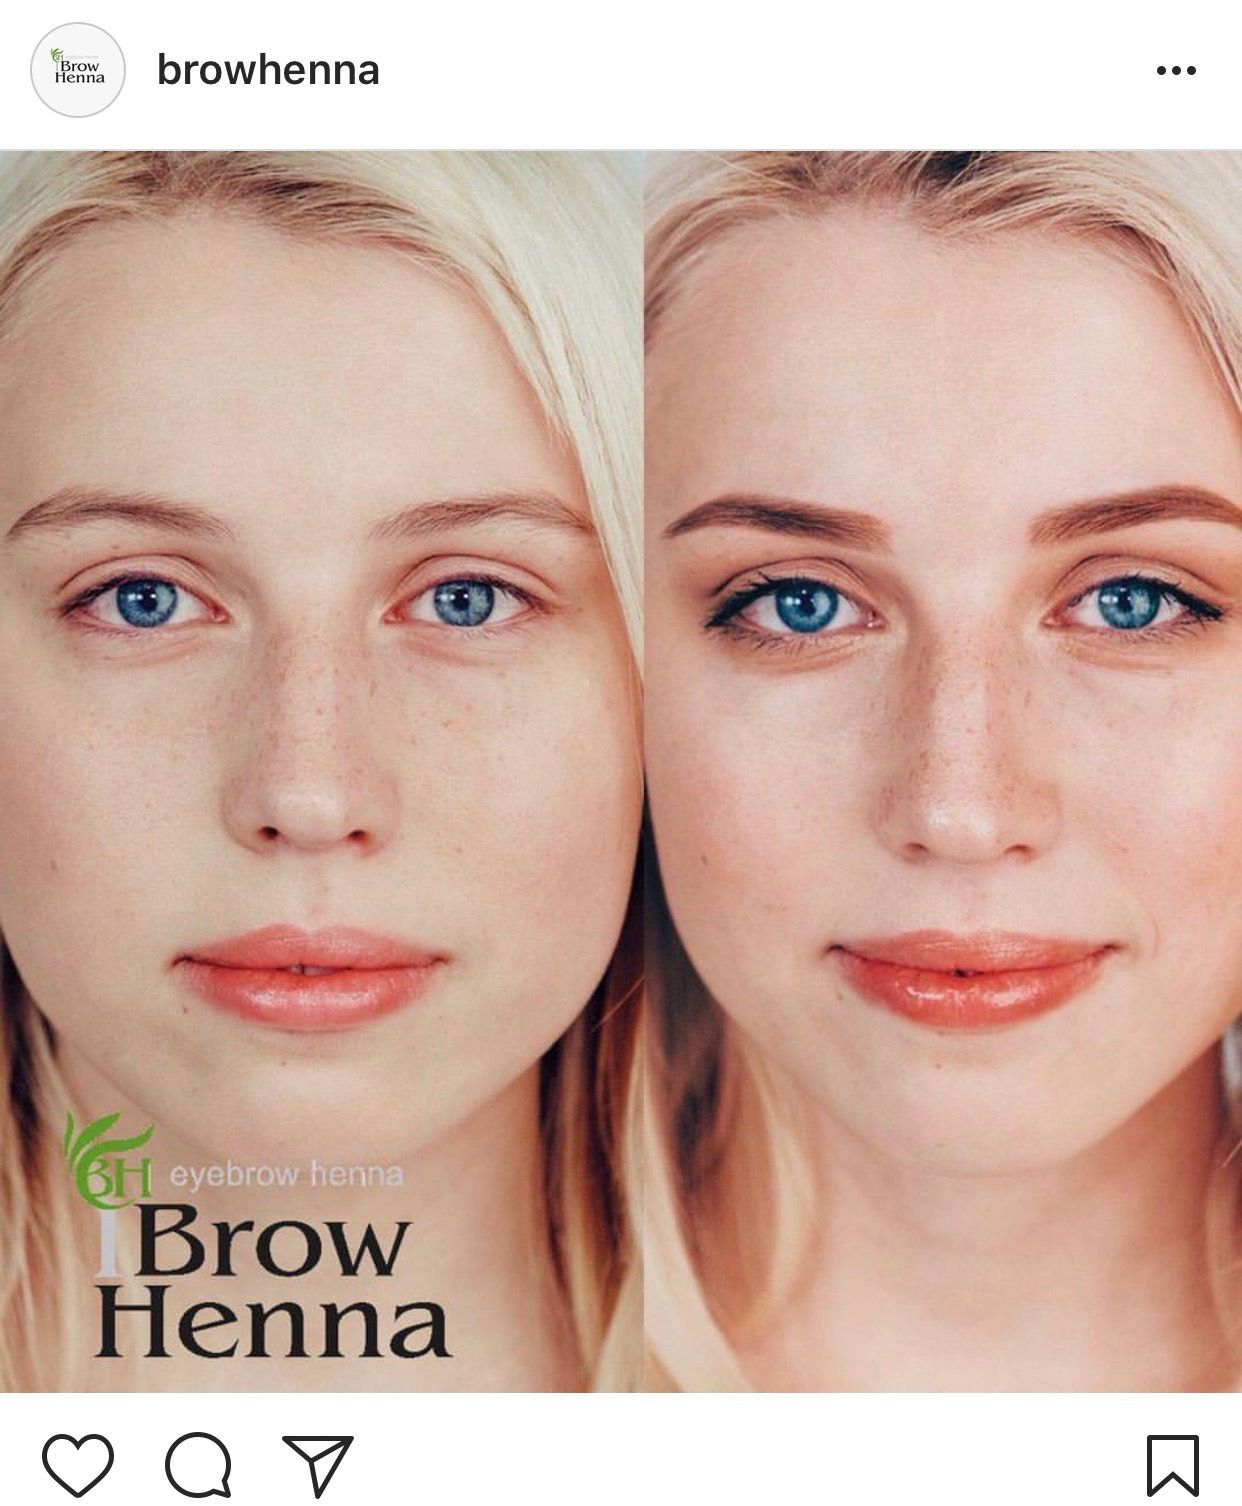 Pin By Irina Levchuk On Bh Brow Henna The Best Organic Tint Hair